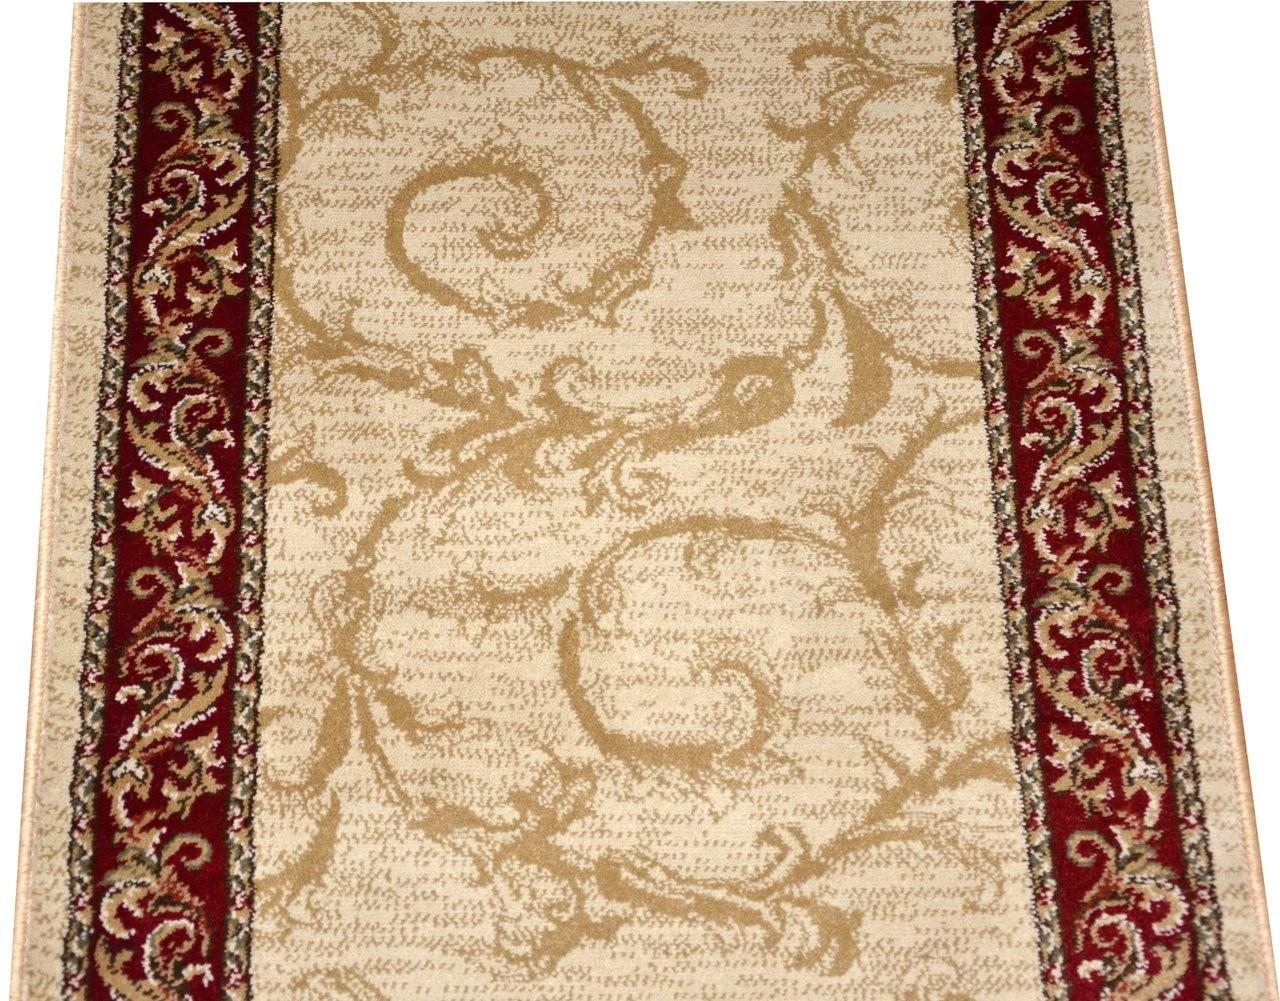 Dean Tan Scrollworks Carpet Rug Hallway Stair Runner Purchase By | Hallway Carpet Runners Sold By The Foot | Rug Depot | Hall | Woven Rug | Wool Rug | Fleur De Lis